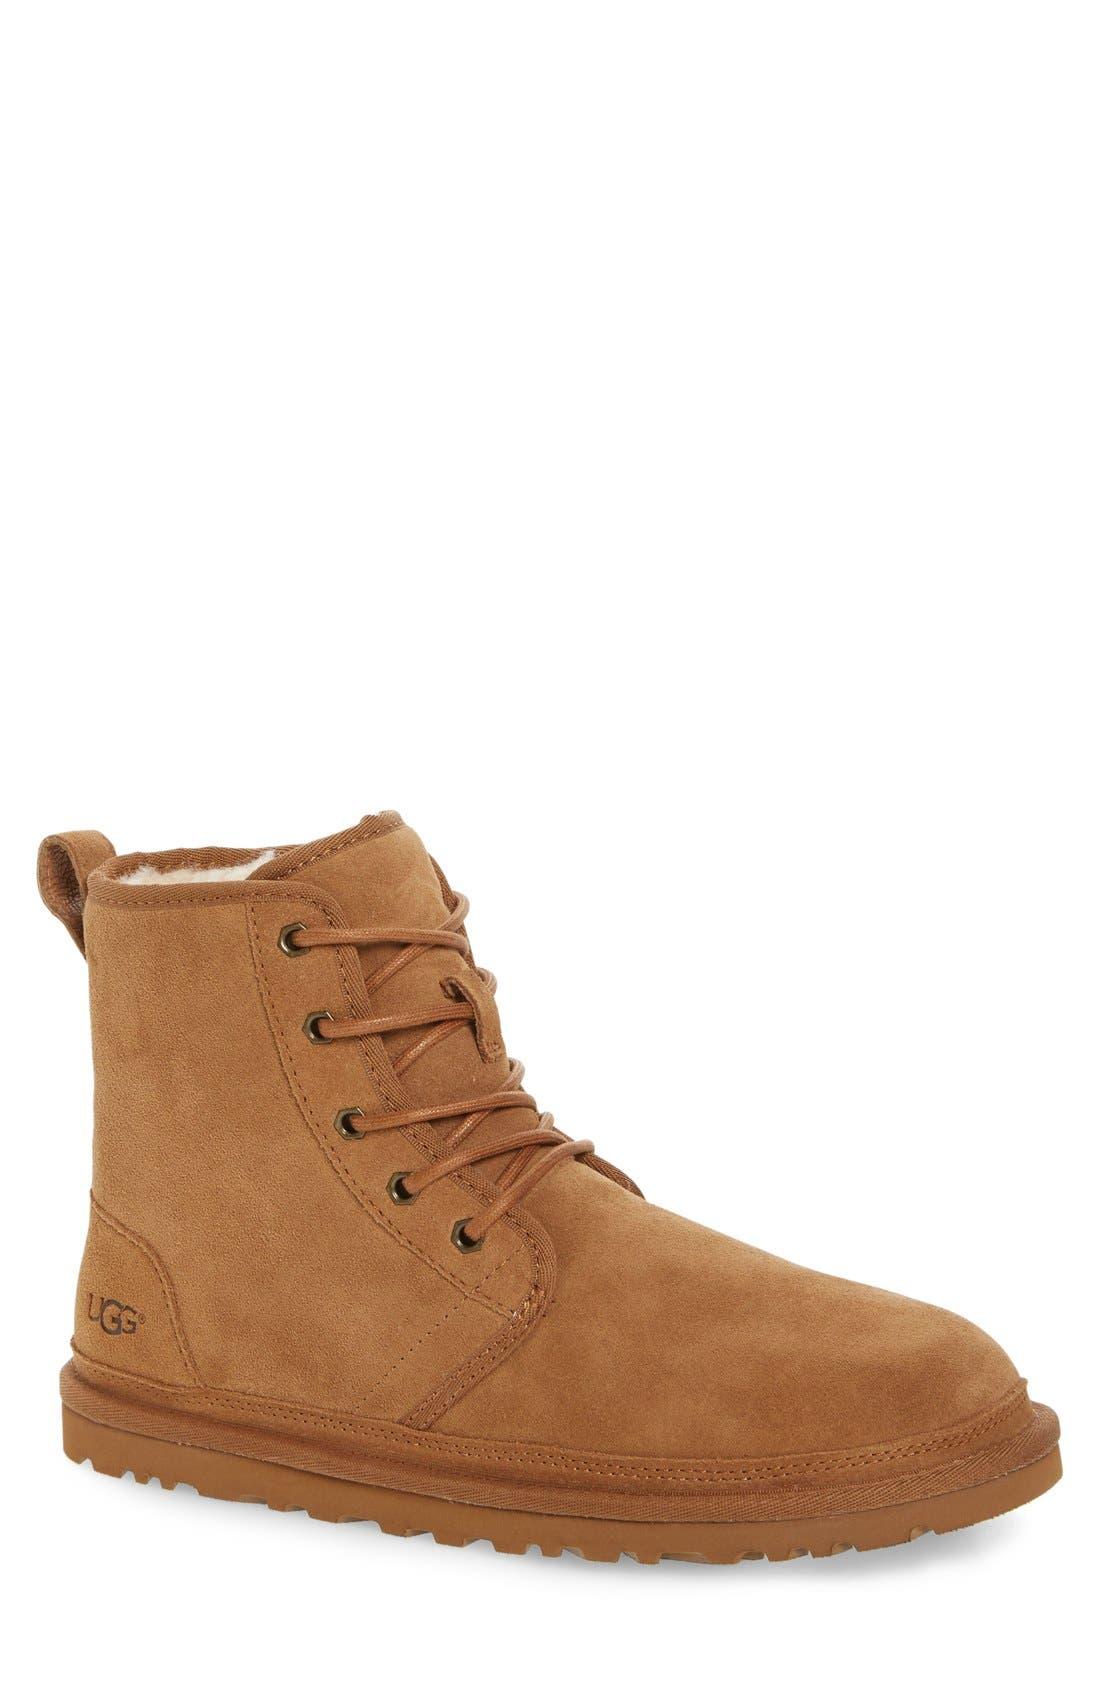 Alternate Image 1 Selected - UGG® Harkley Lace-Up Boot (Men)